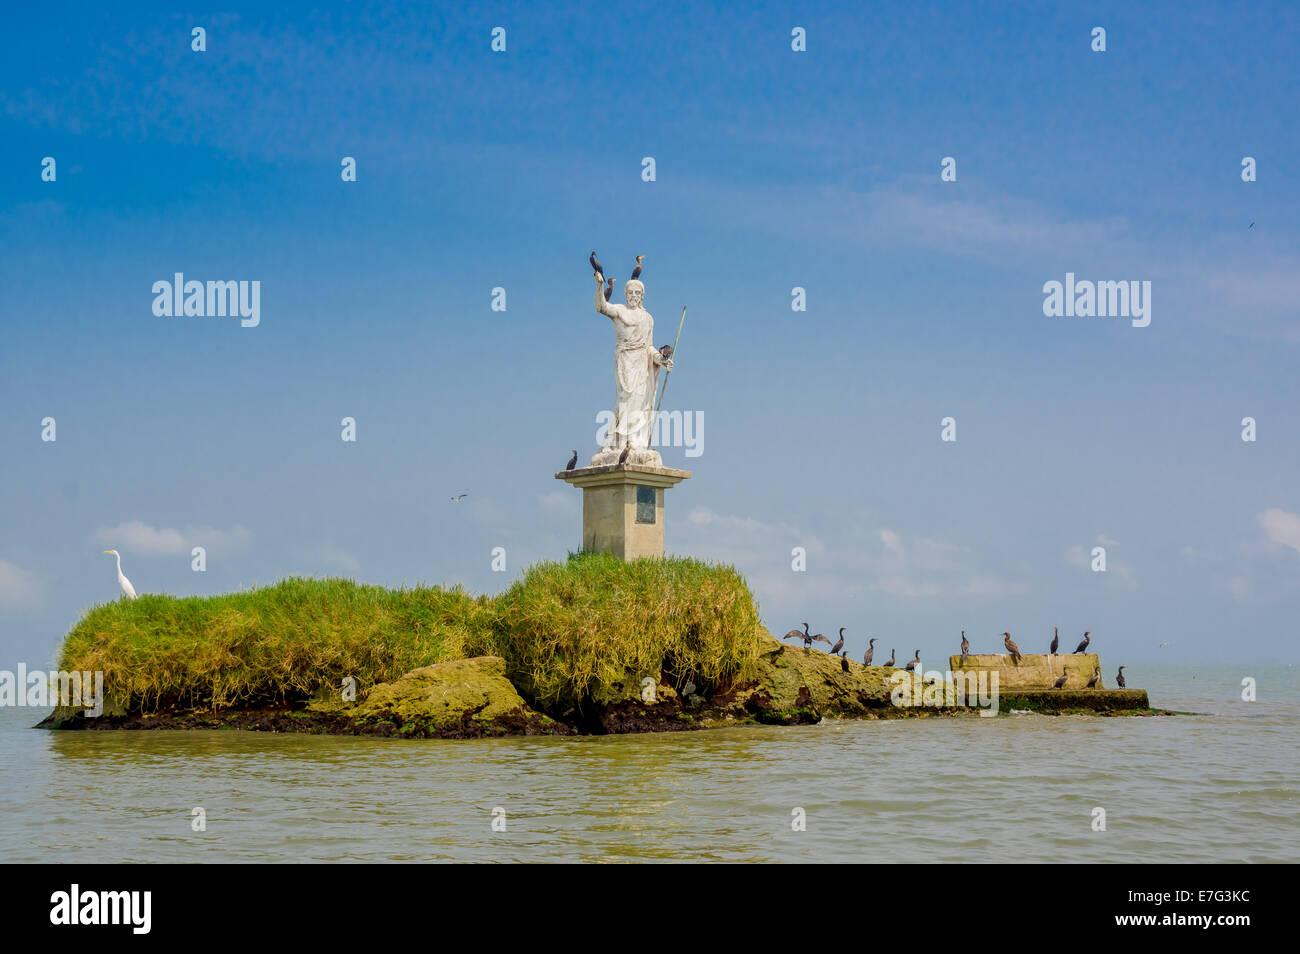 statue in livingston guatemala - Stock Image